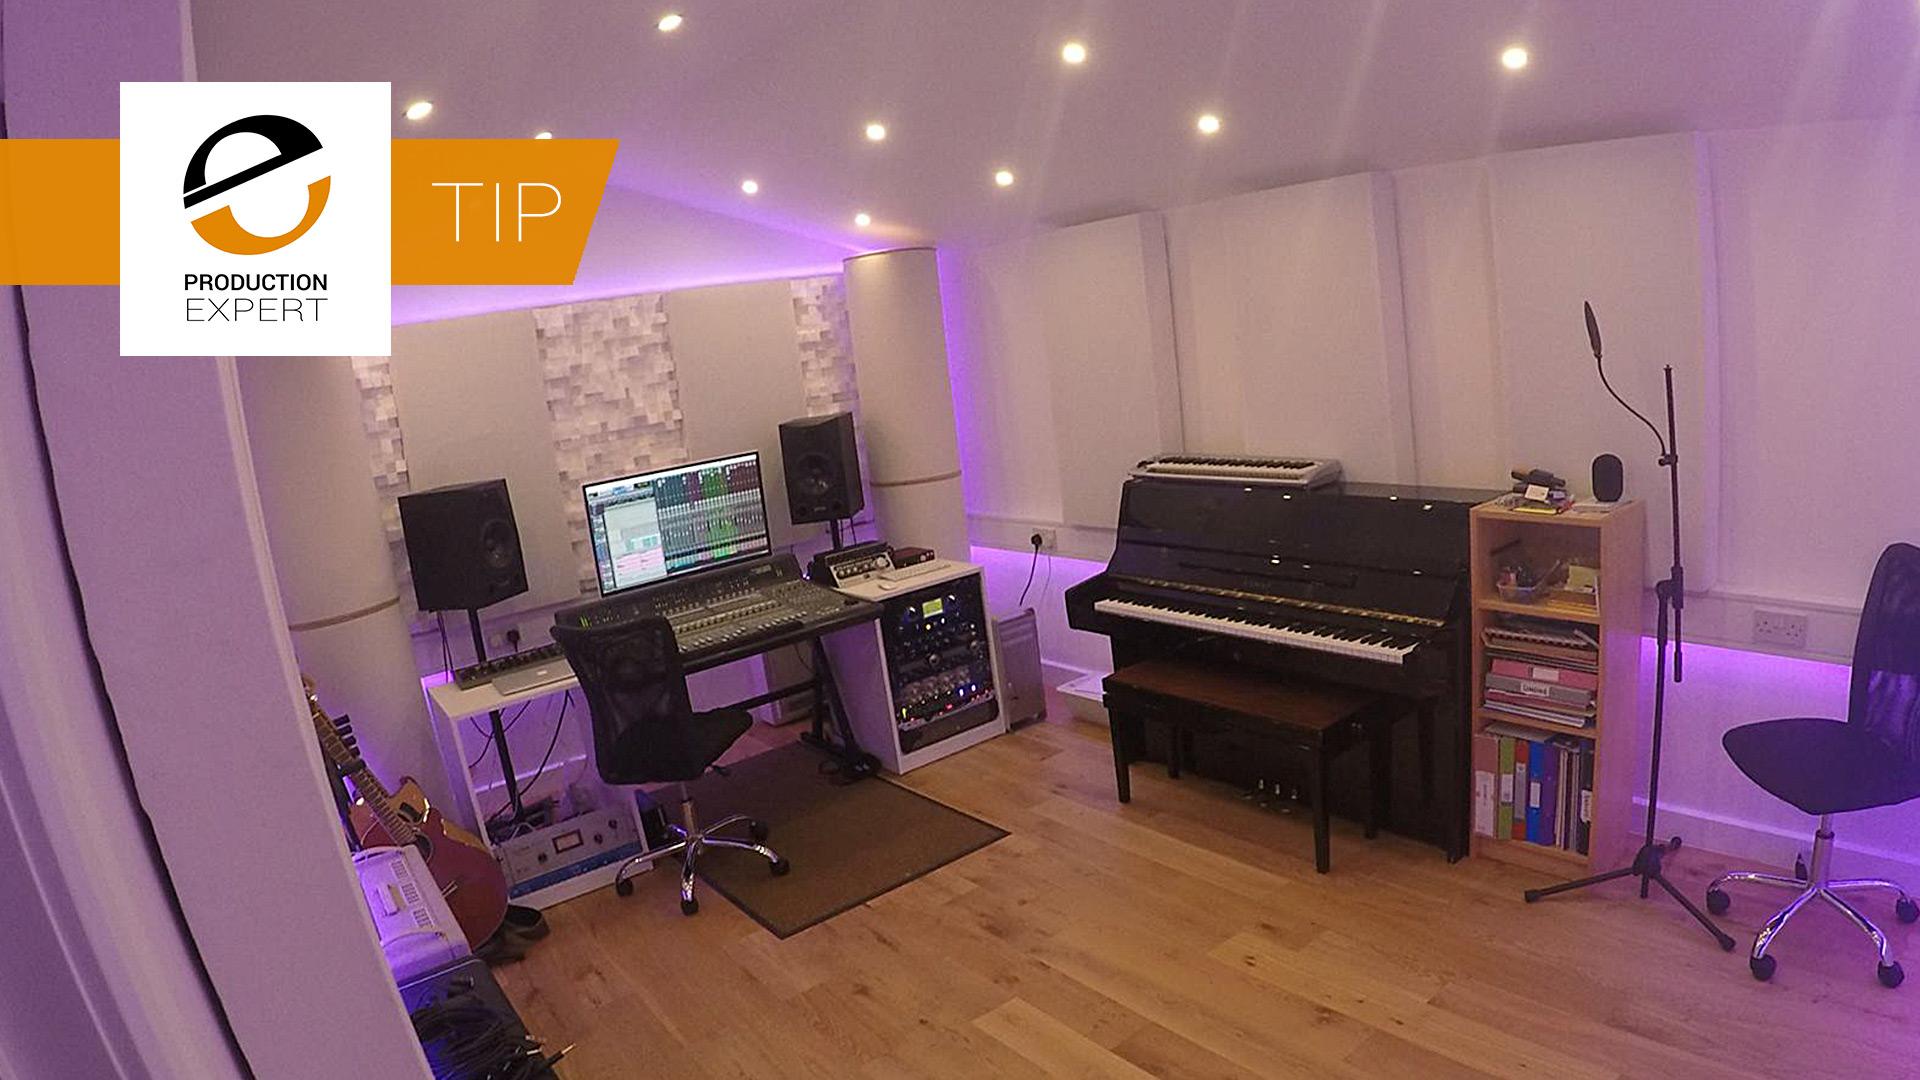 Recording-Studio-Aesthetics---Studios-Should-Look-As-Good-As-They-Sound.jpg